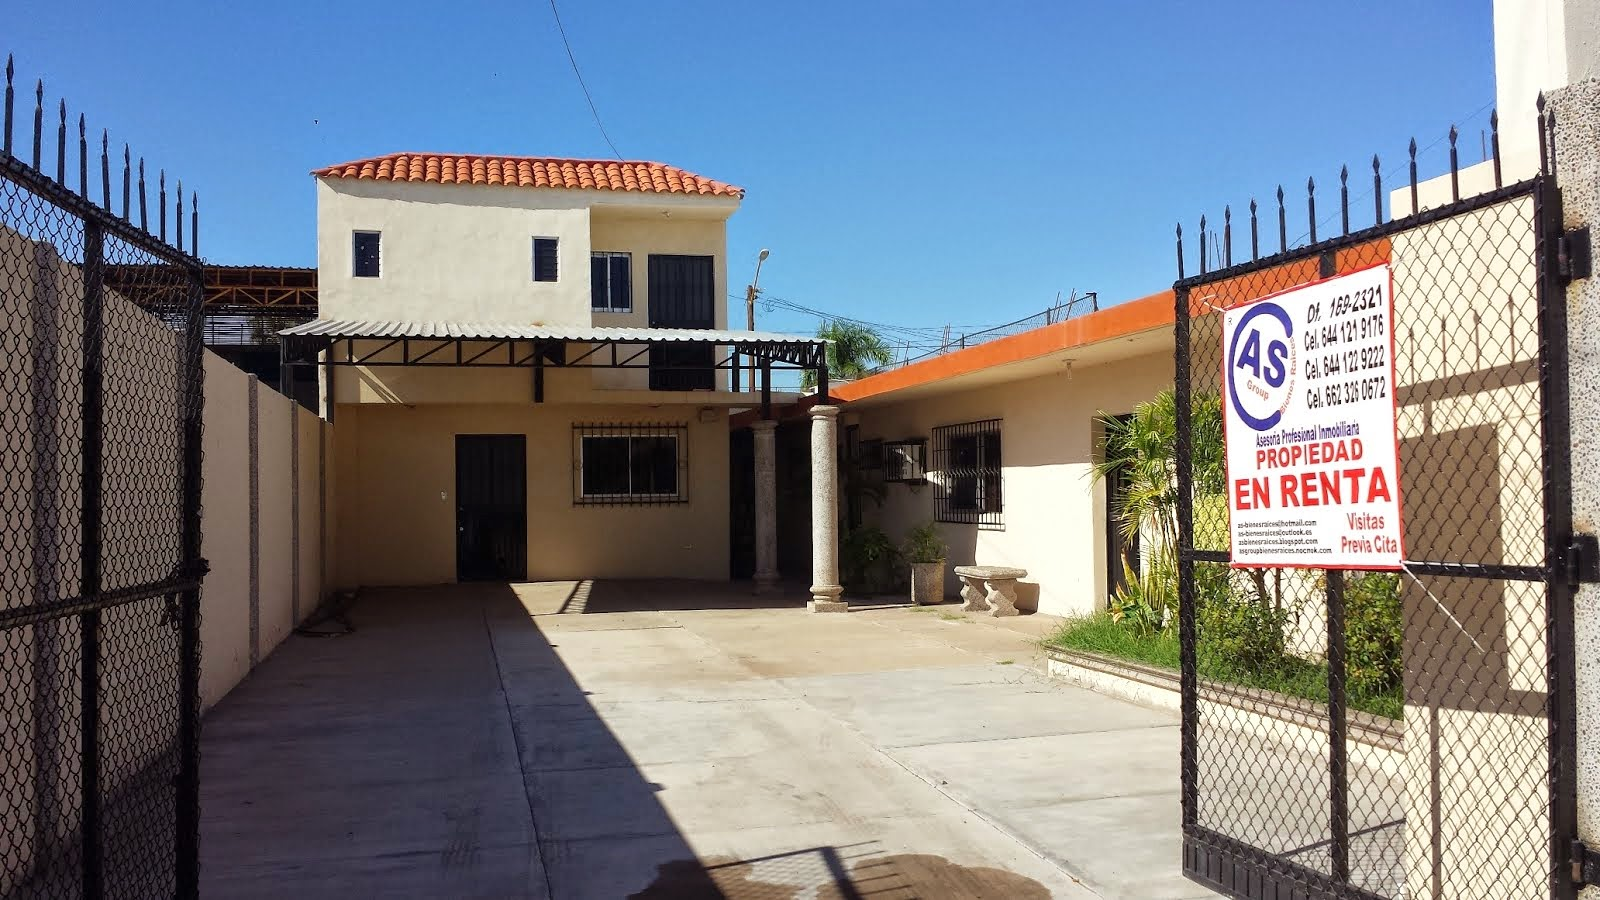 RENTA Col, Centro $4000